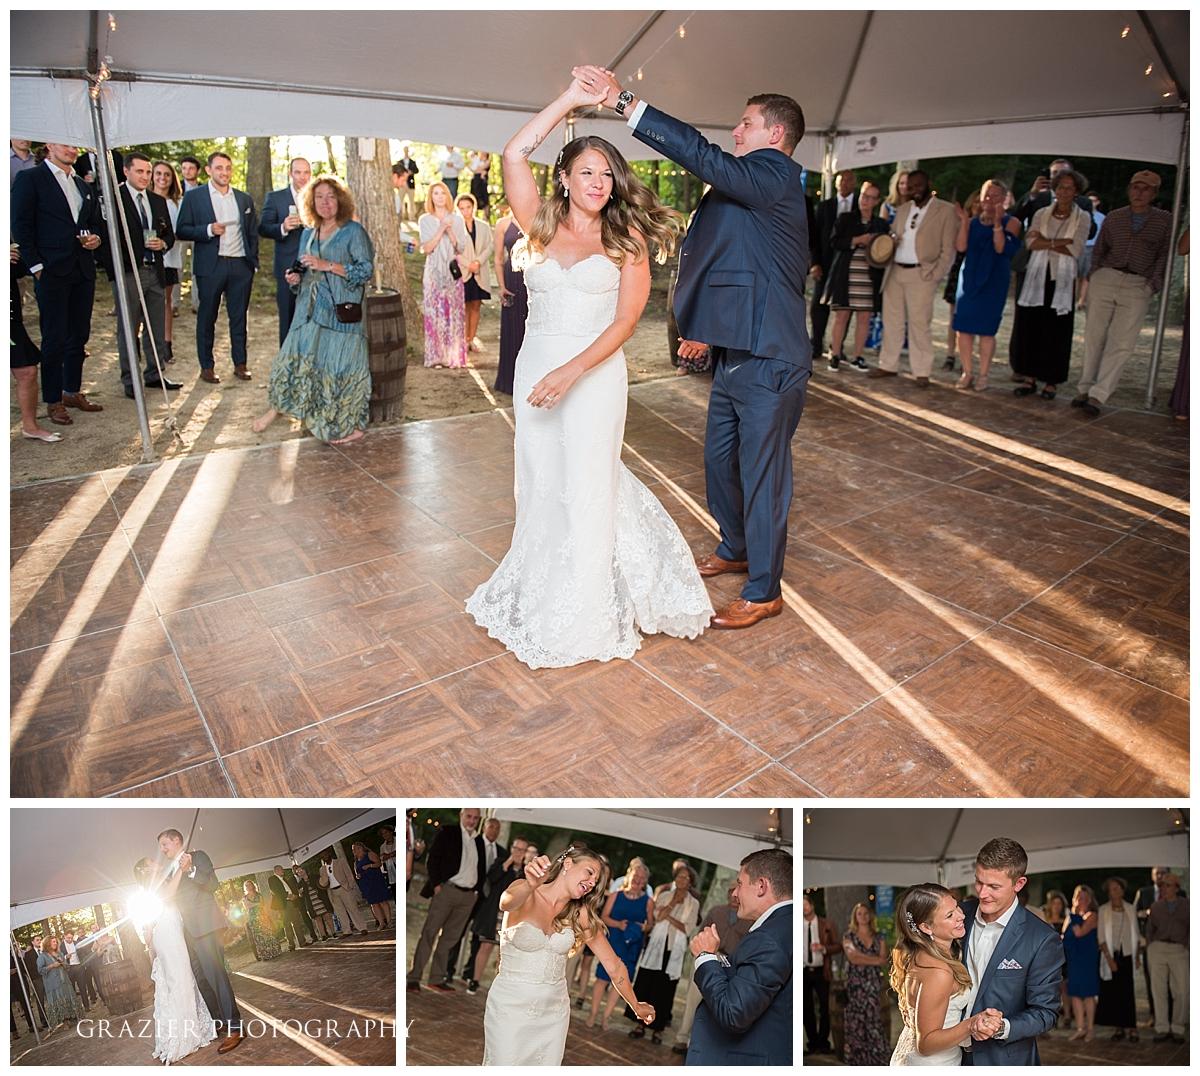 New Hampshire Lake Wedding Grazier Photography 170909-185_WEB.jpg